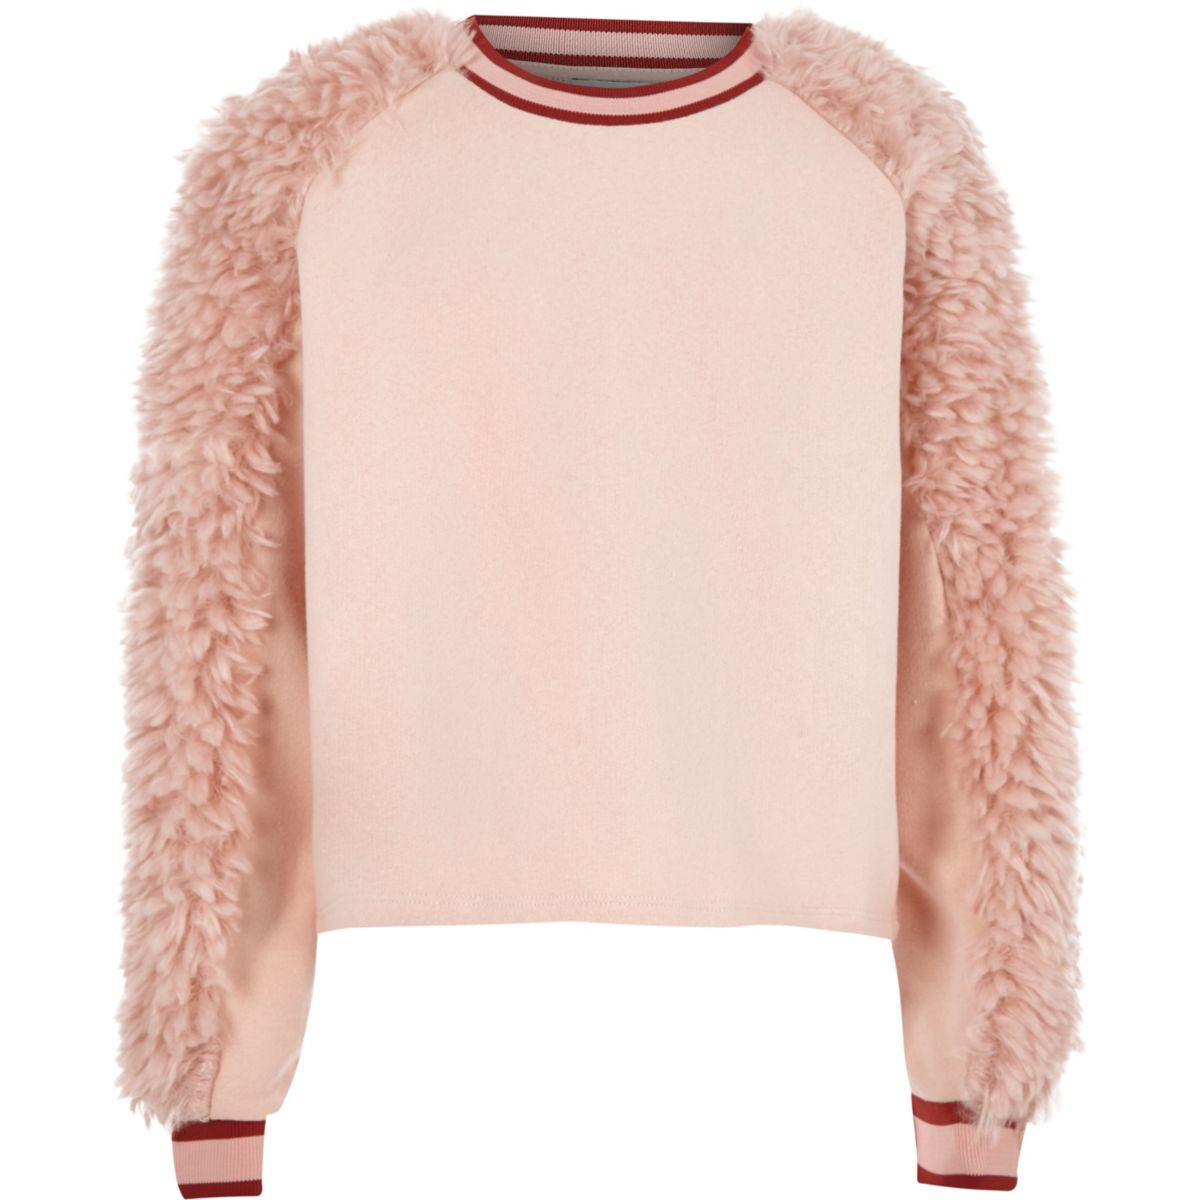 Girls pink faux fur panel sweat sweater